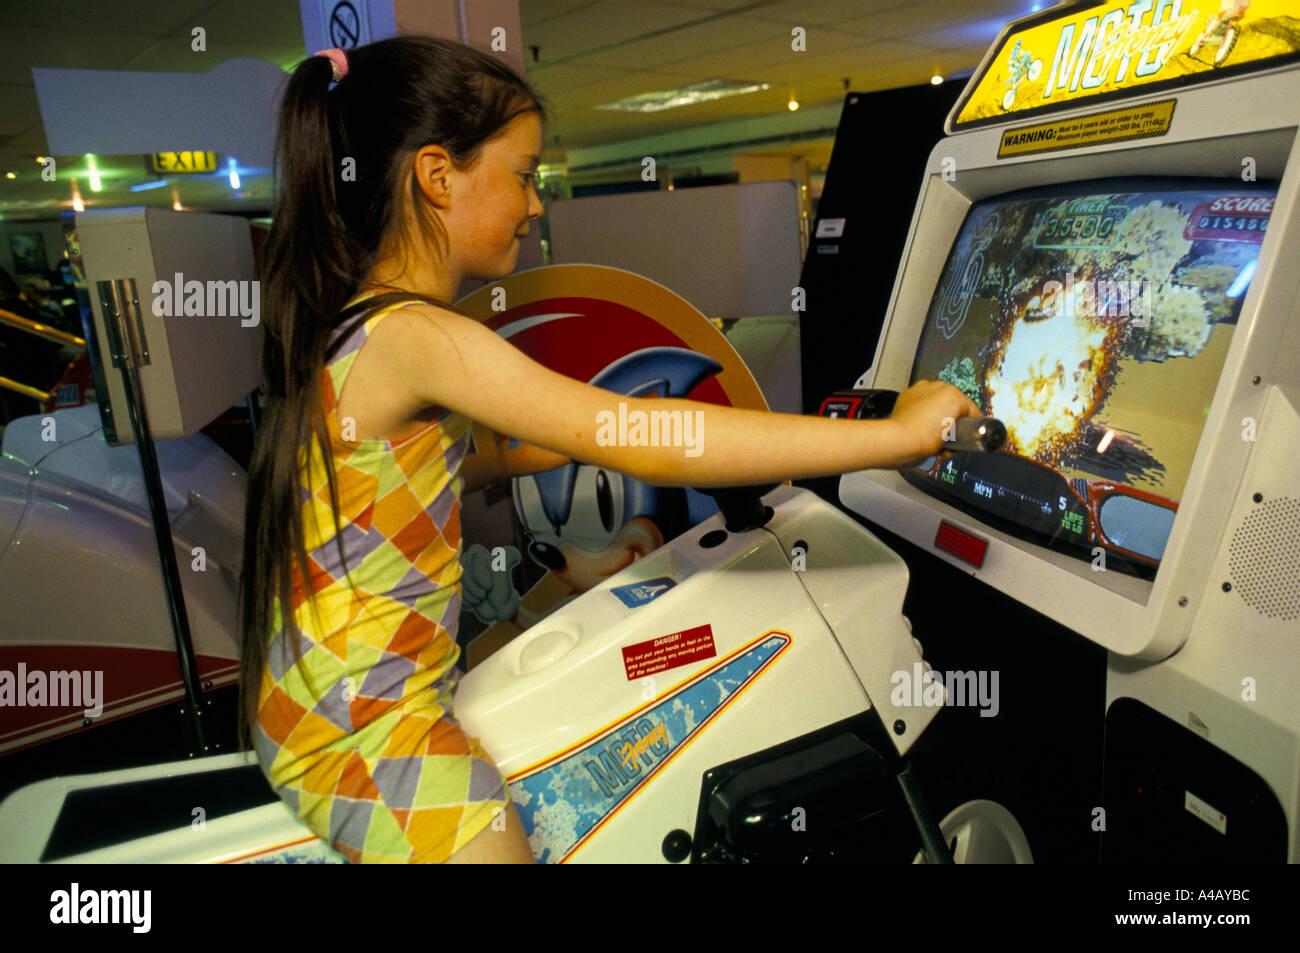 young girl on a sega virtual reality motorbkie racing game hamleys toy shop london - Stock Image